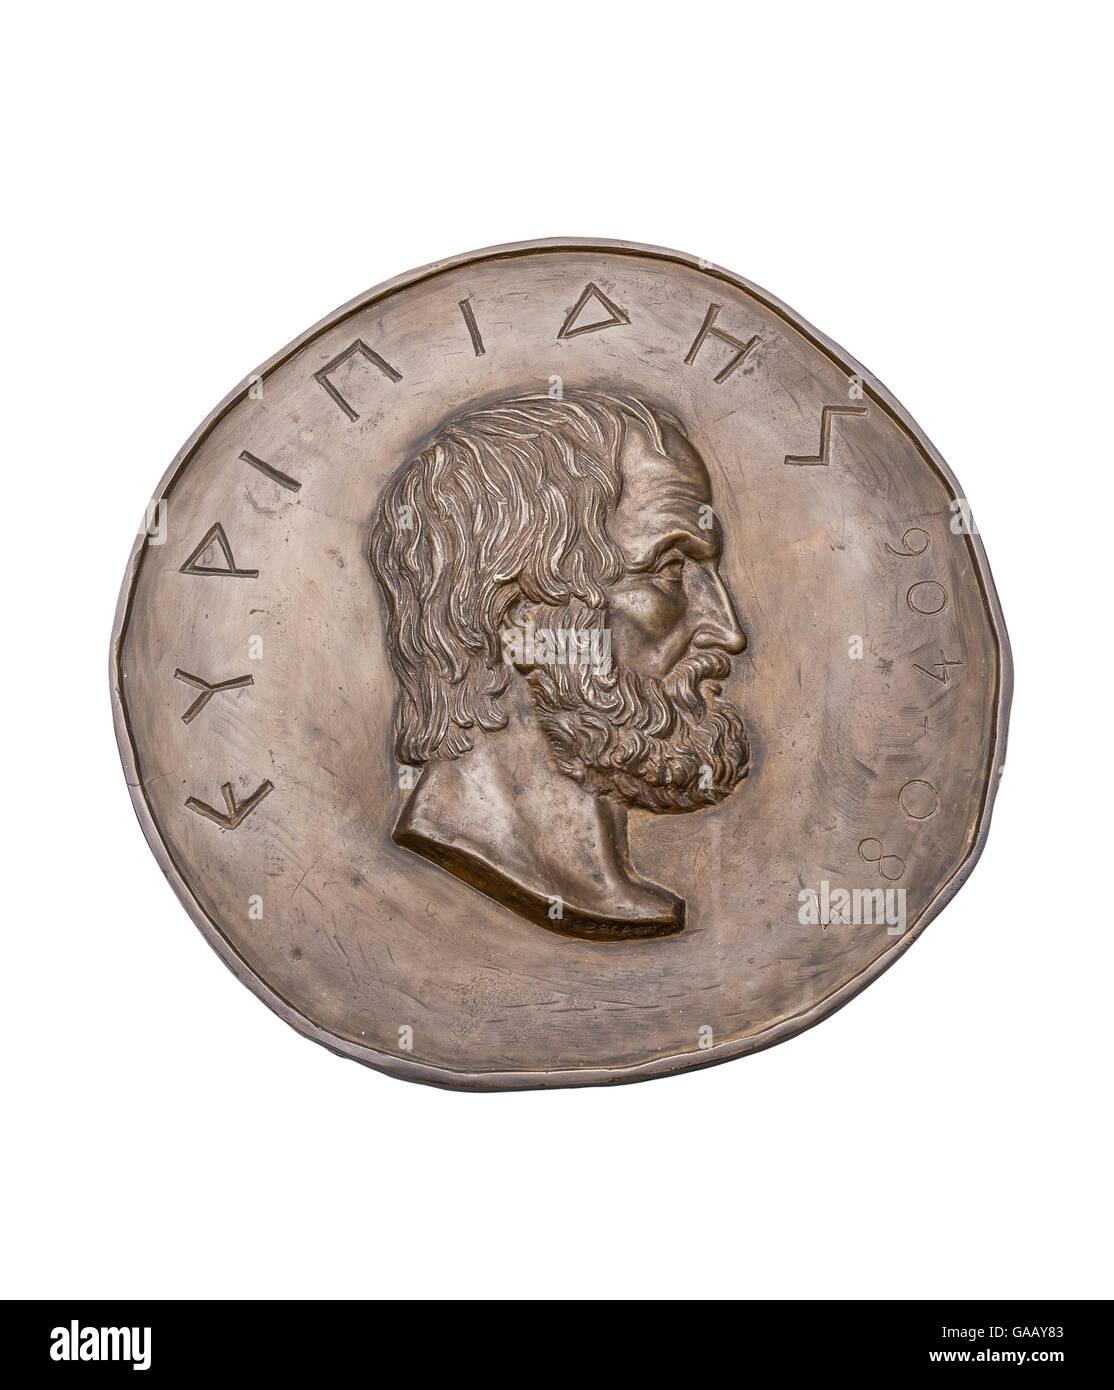 Greek Novelist Euripides on Ancient Bronze Medal - Stock Image